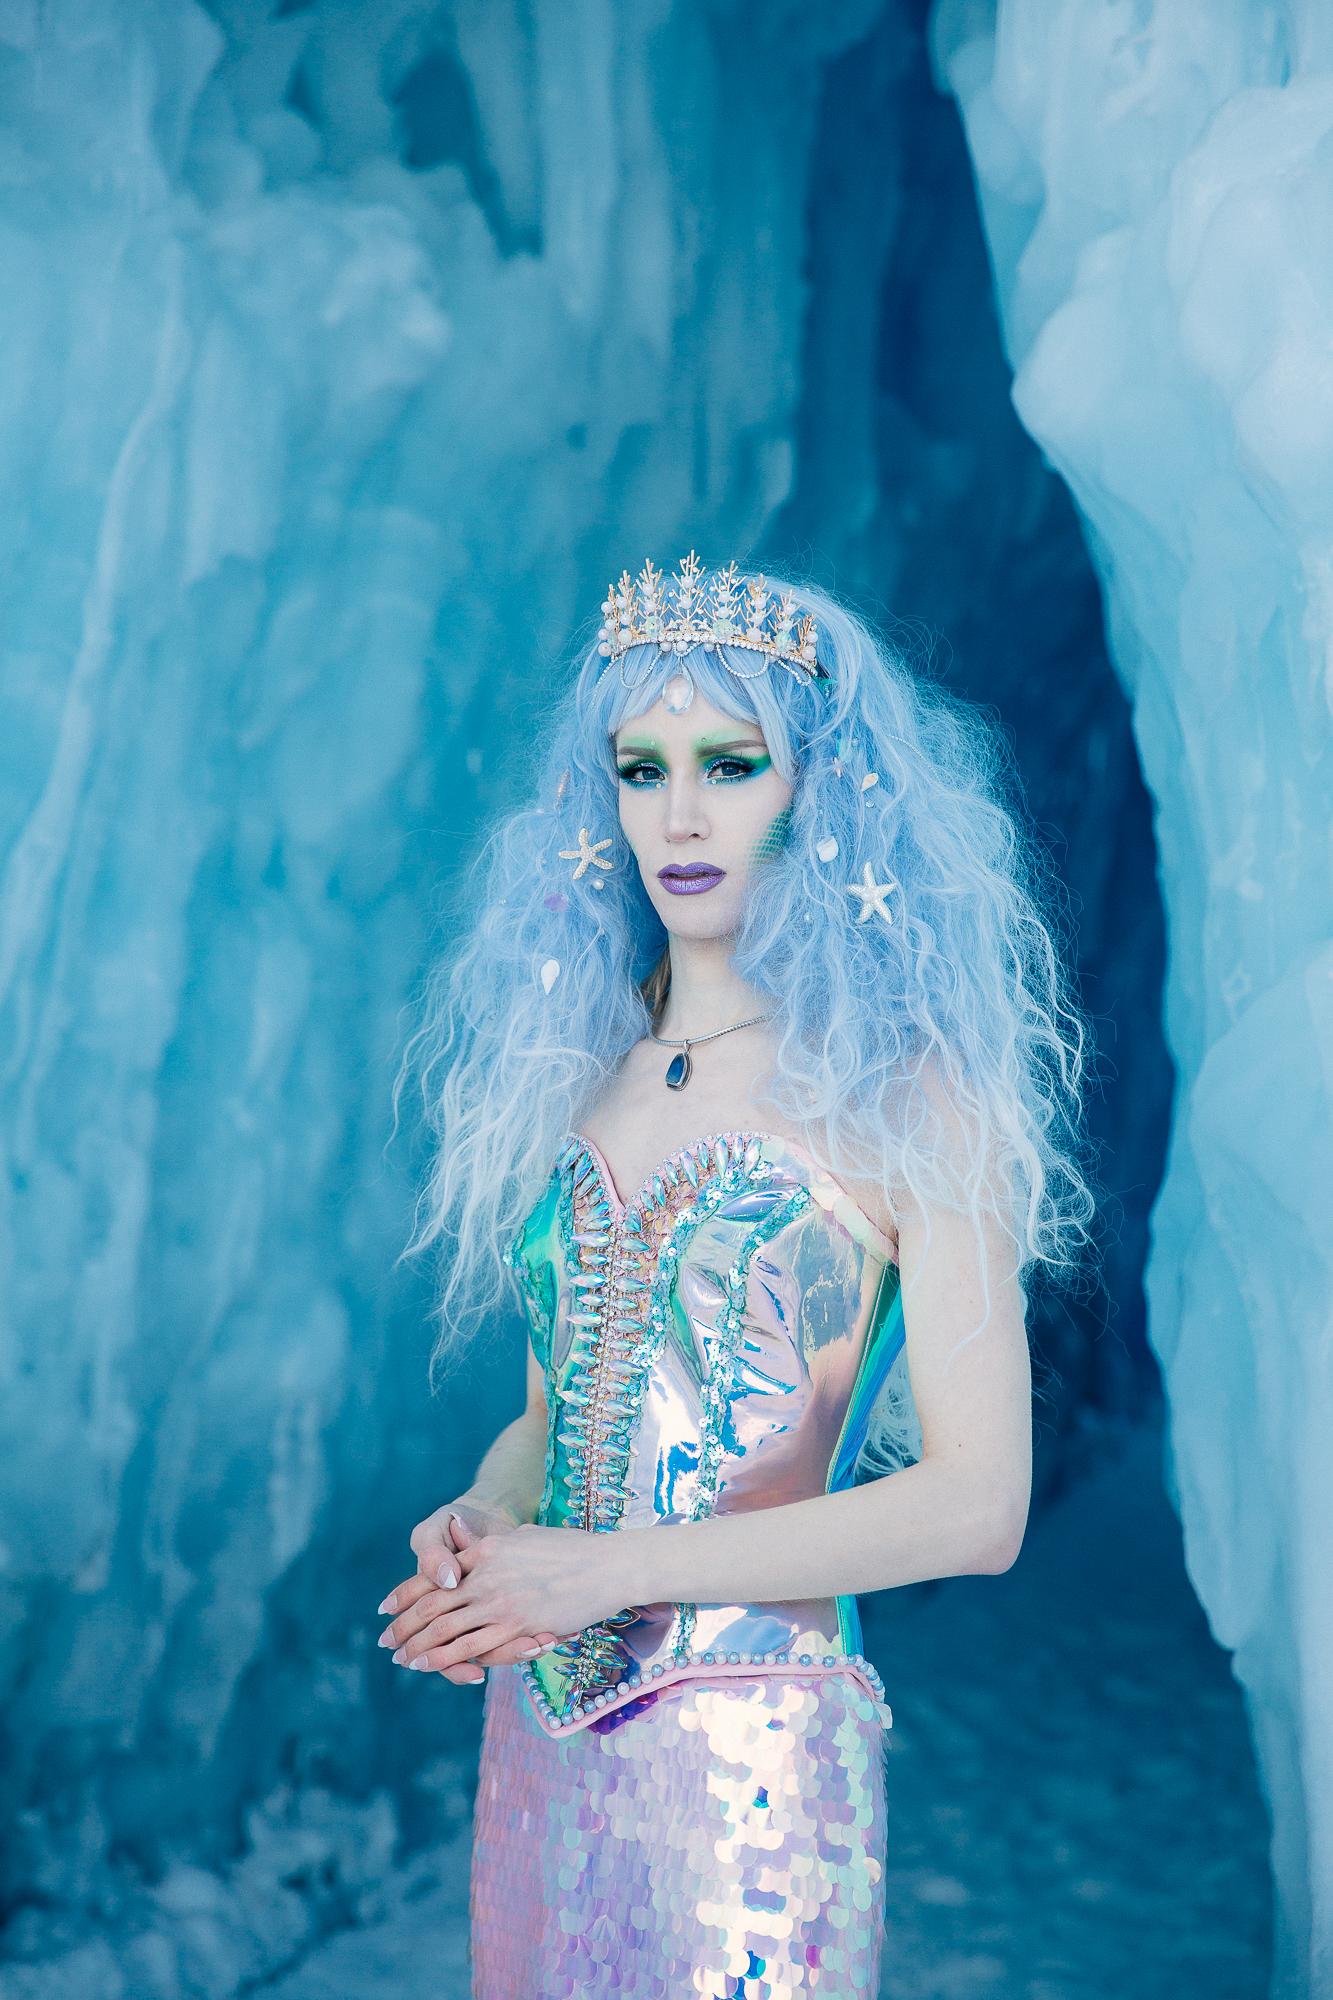 Jen_Montgomery_Photography_KMK_Ice_Mermaids_REEDITS_FB-7.jpg